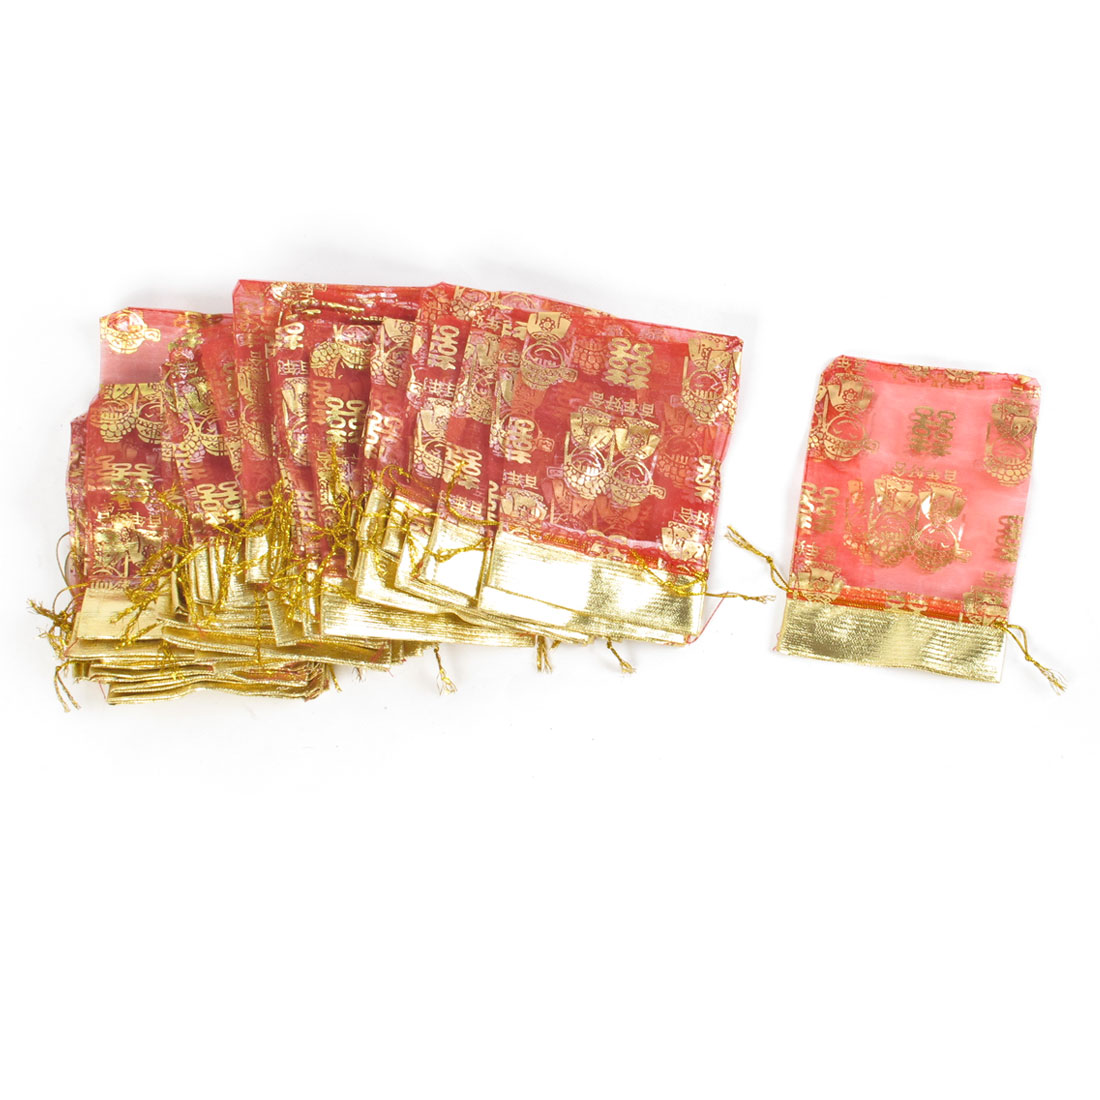 50 Pcs Red Gold Tone Bride And Bridegroom Print Wedding Organza Gift Bag